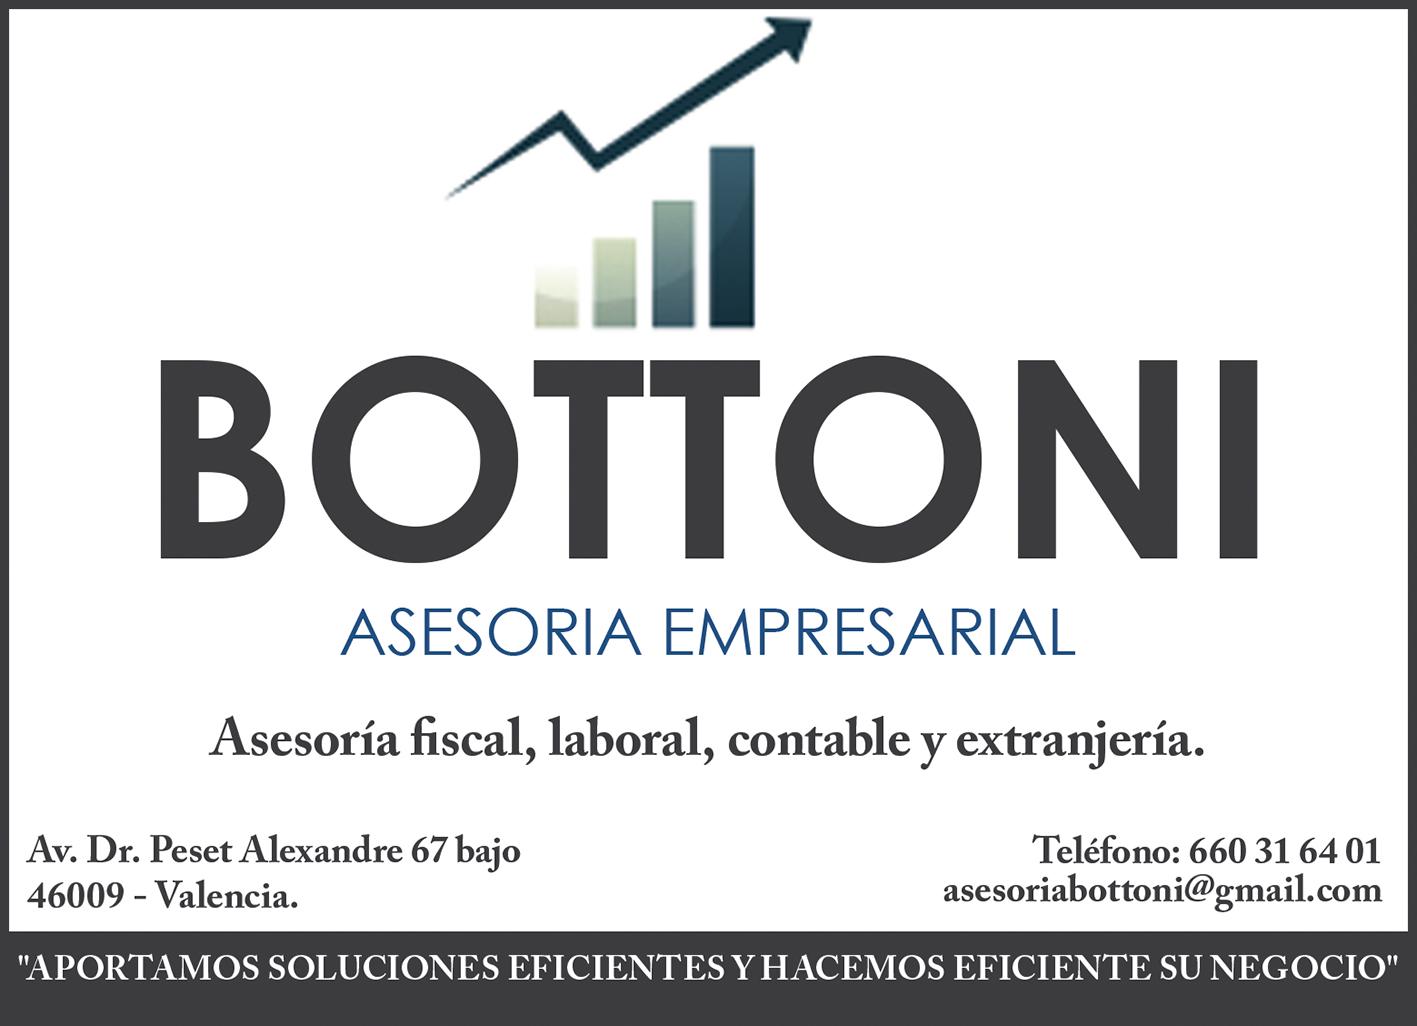 Asesoría Bottoni